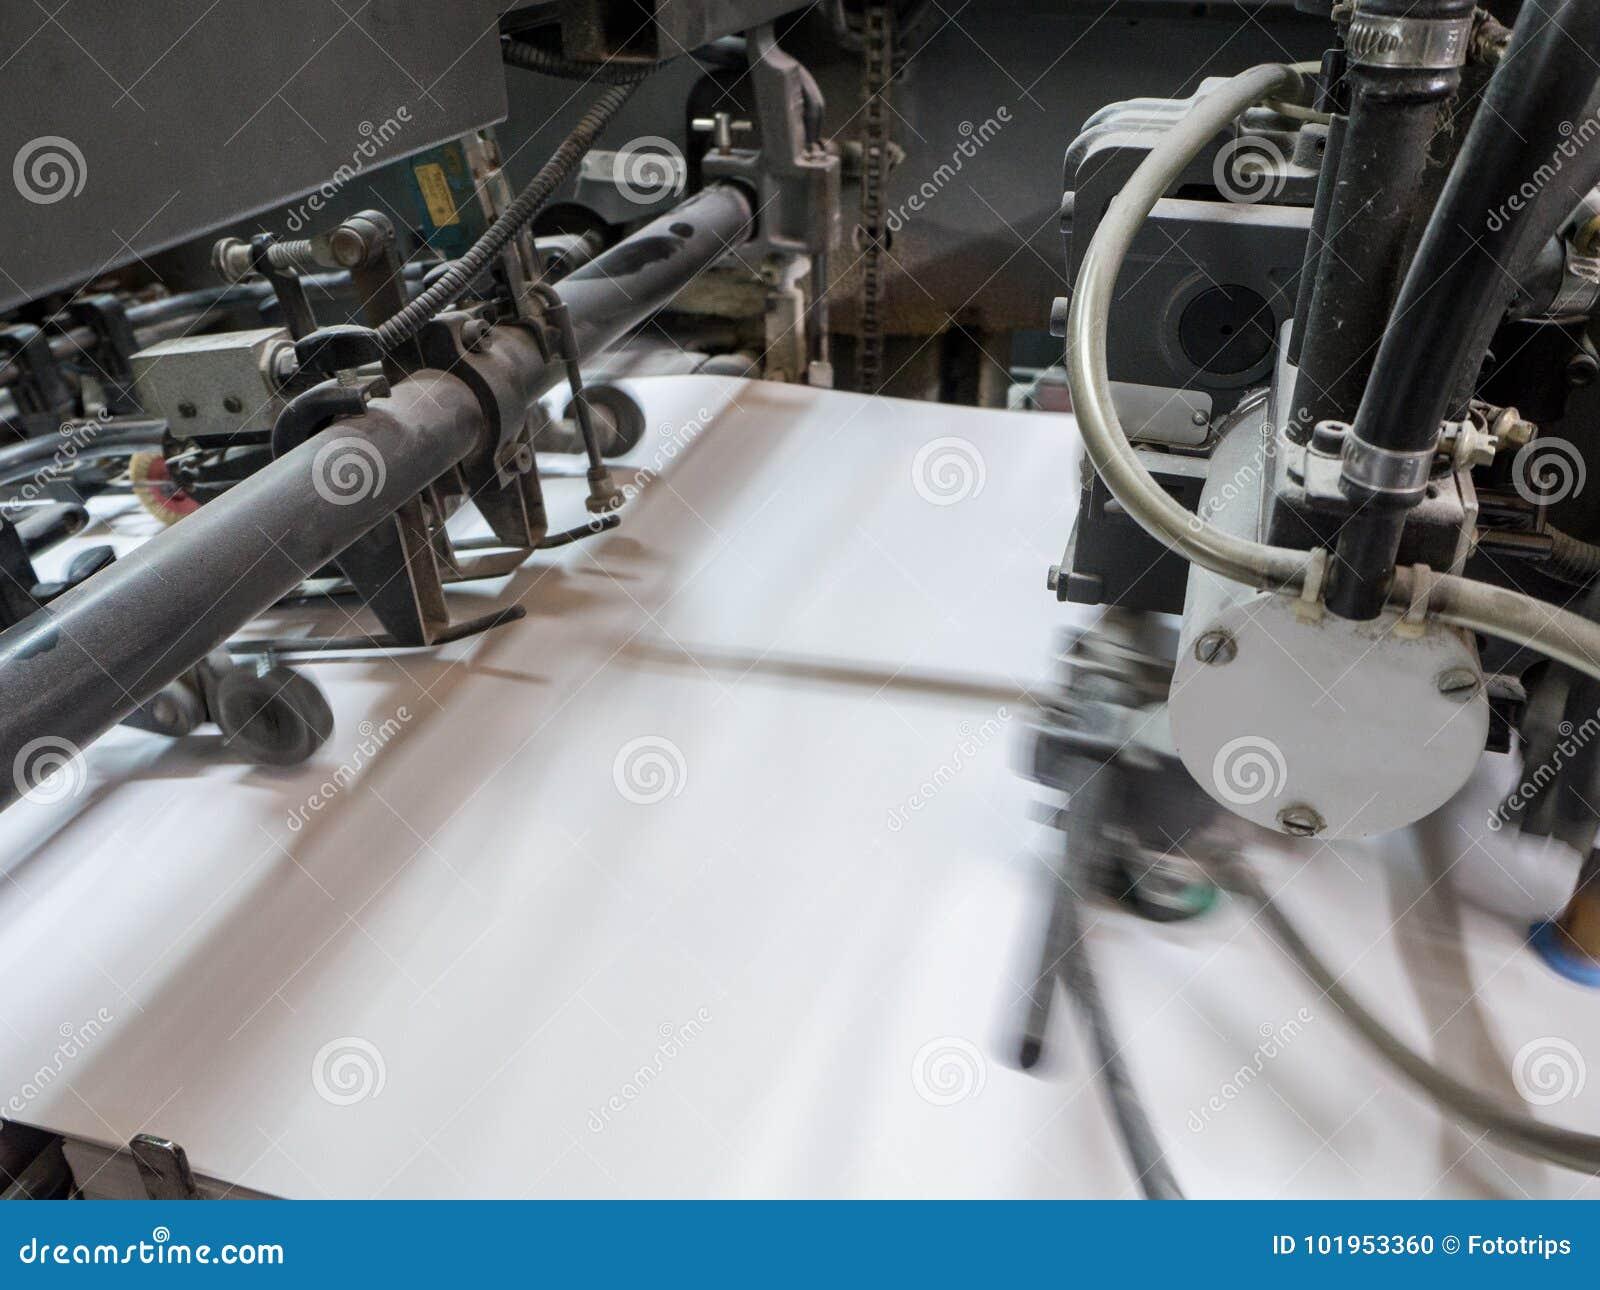 Printing Press Machine In A Modern House